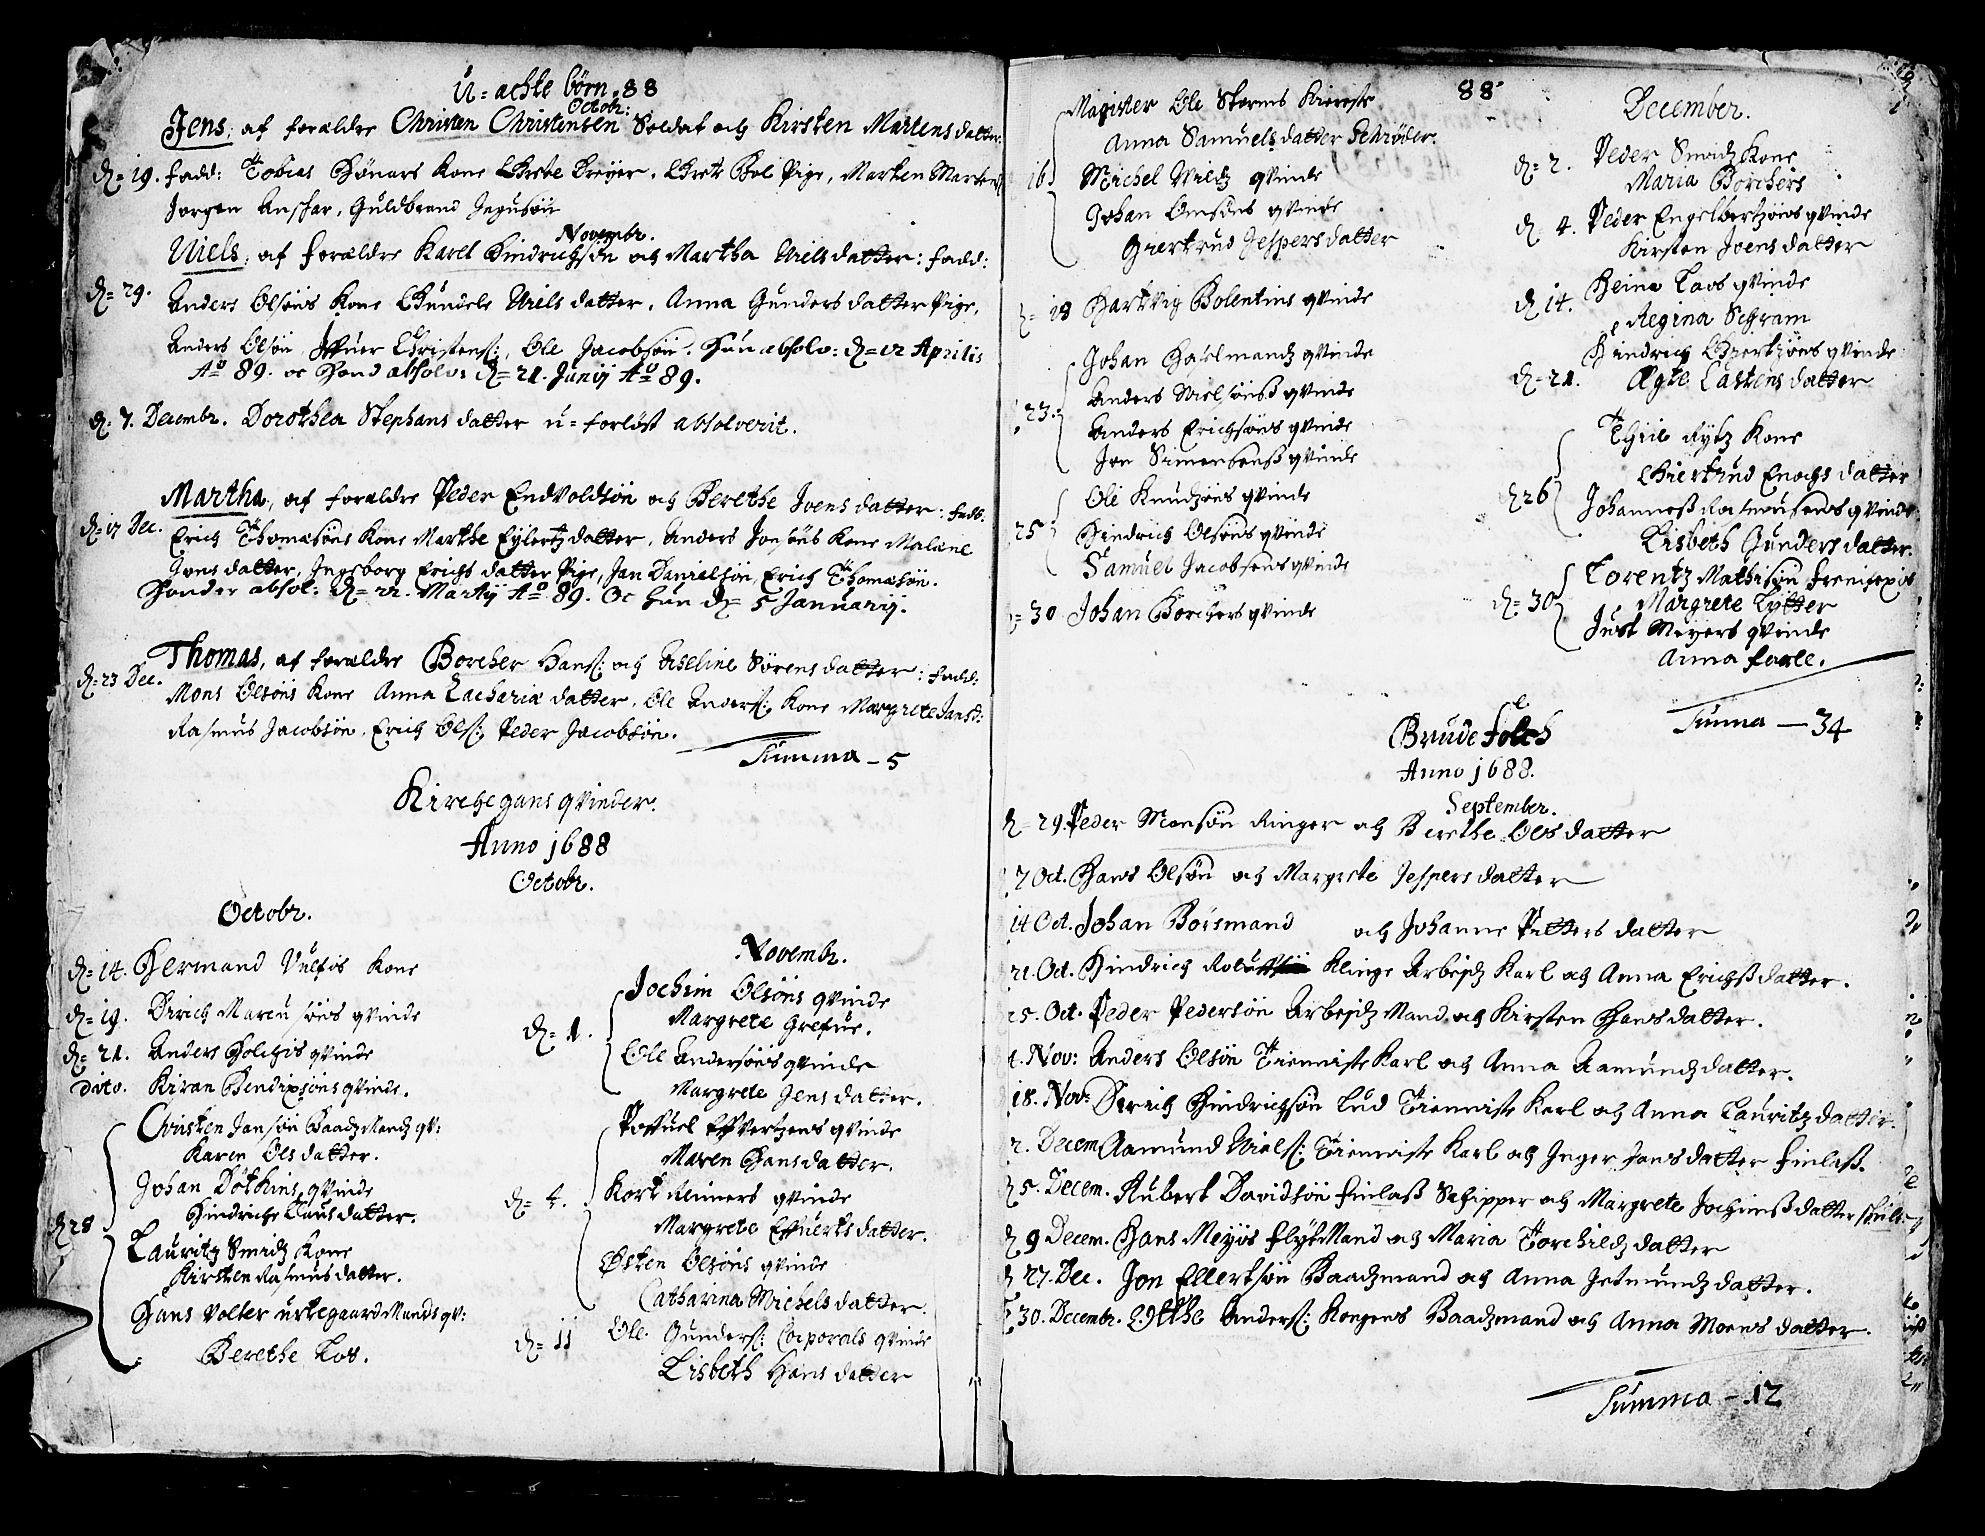 SAB, Korskirken Sokneprestembete, H/Haa/L0002: Ministerialbok nr. A 2, 1688-1697, s. 6-7